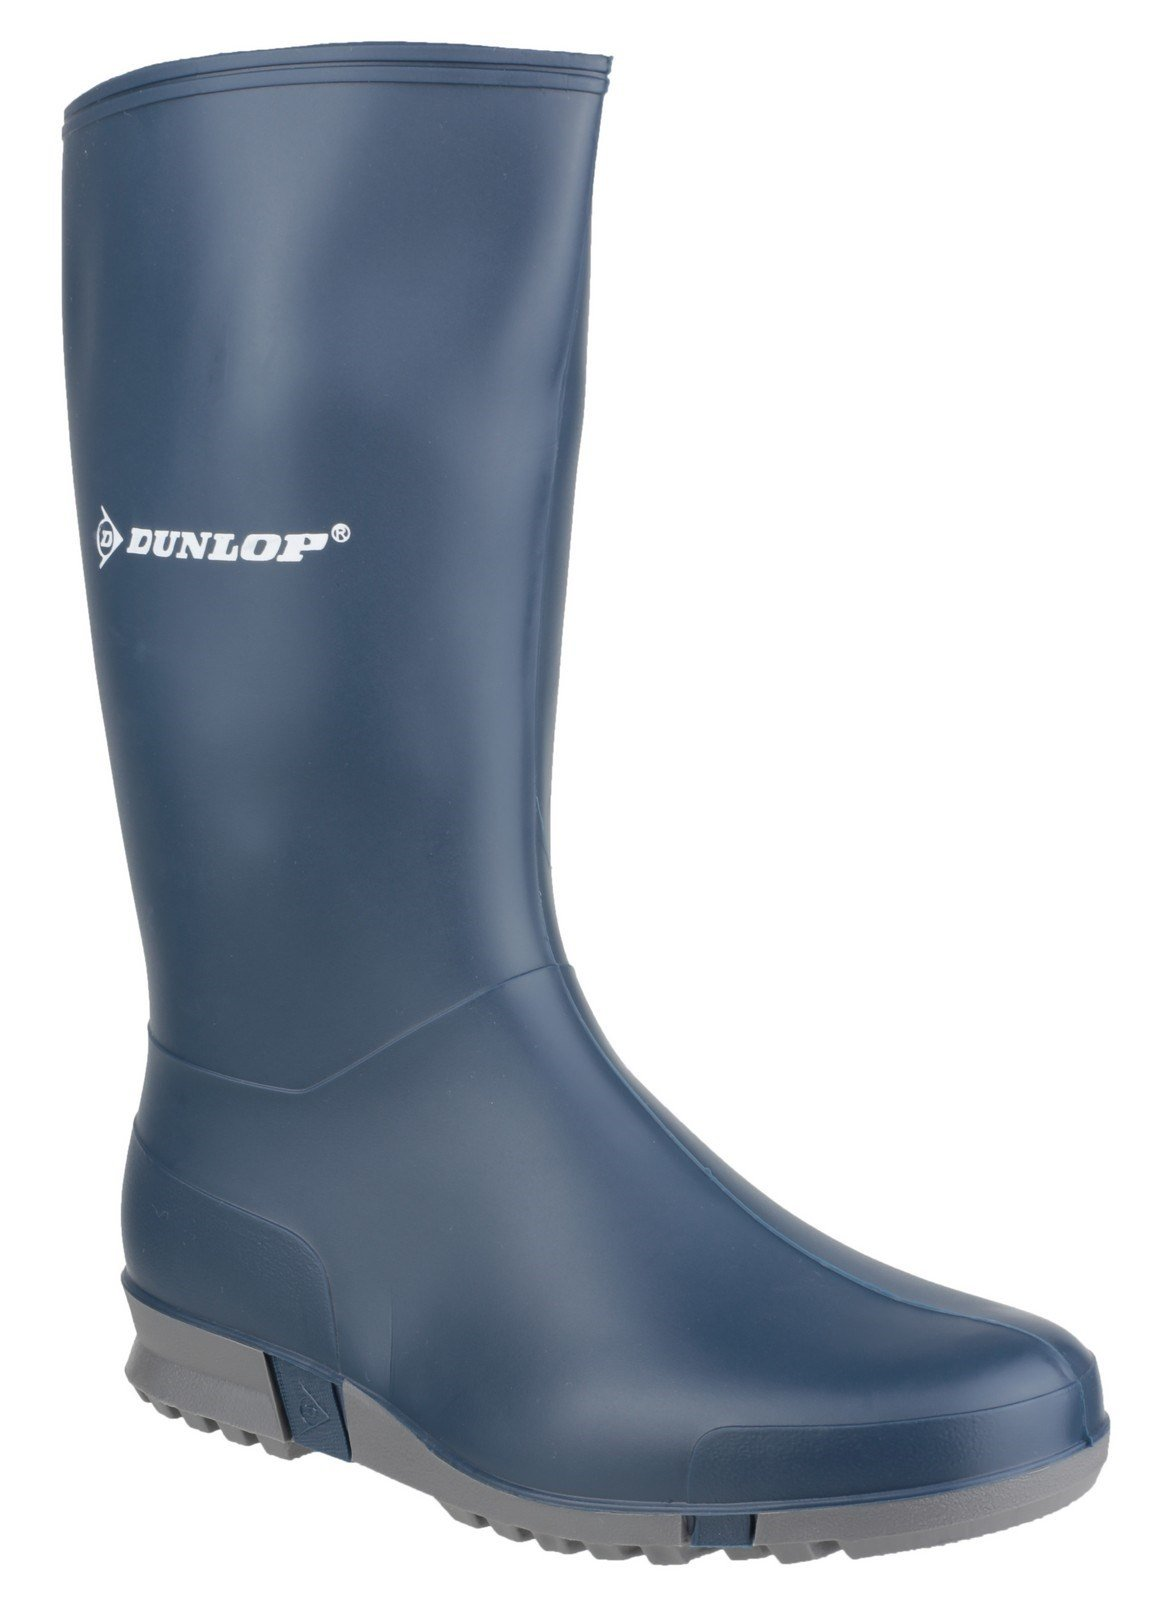 Dunlop Unisex Sport Wellington Boot Blue 08456 - Blue 12